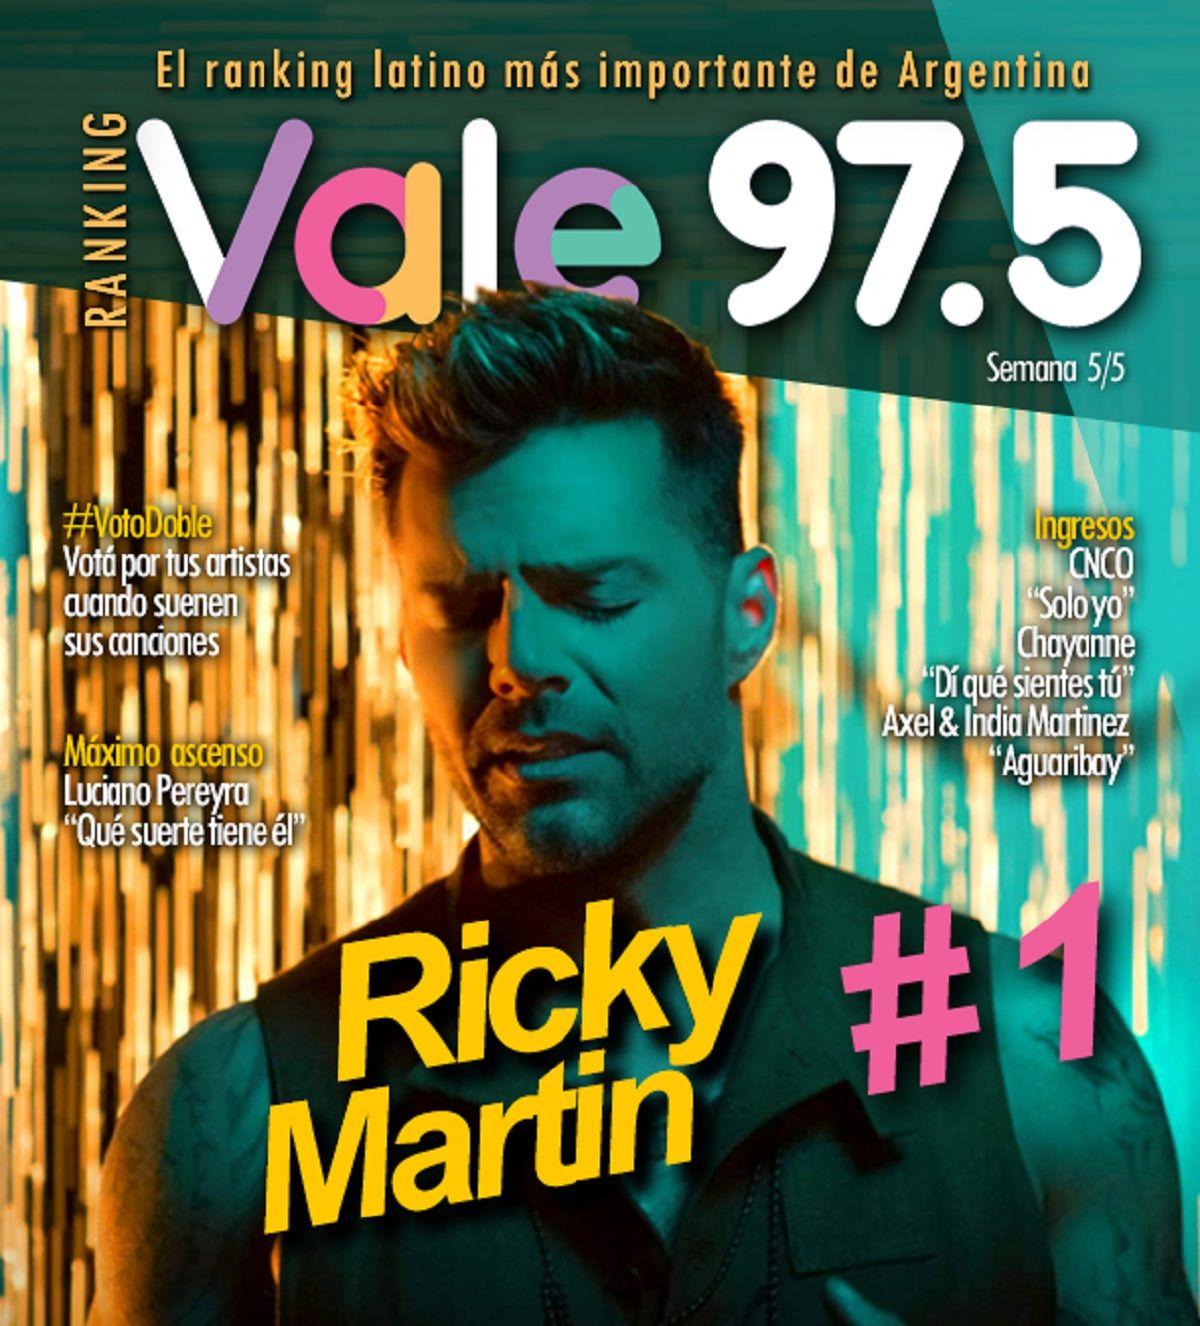 Ricky Martin sigue dominando el Ranking Vale